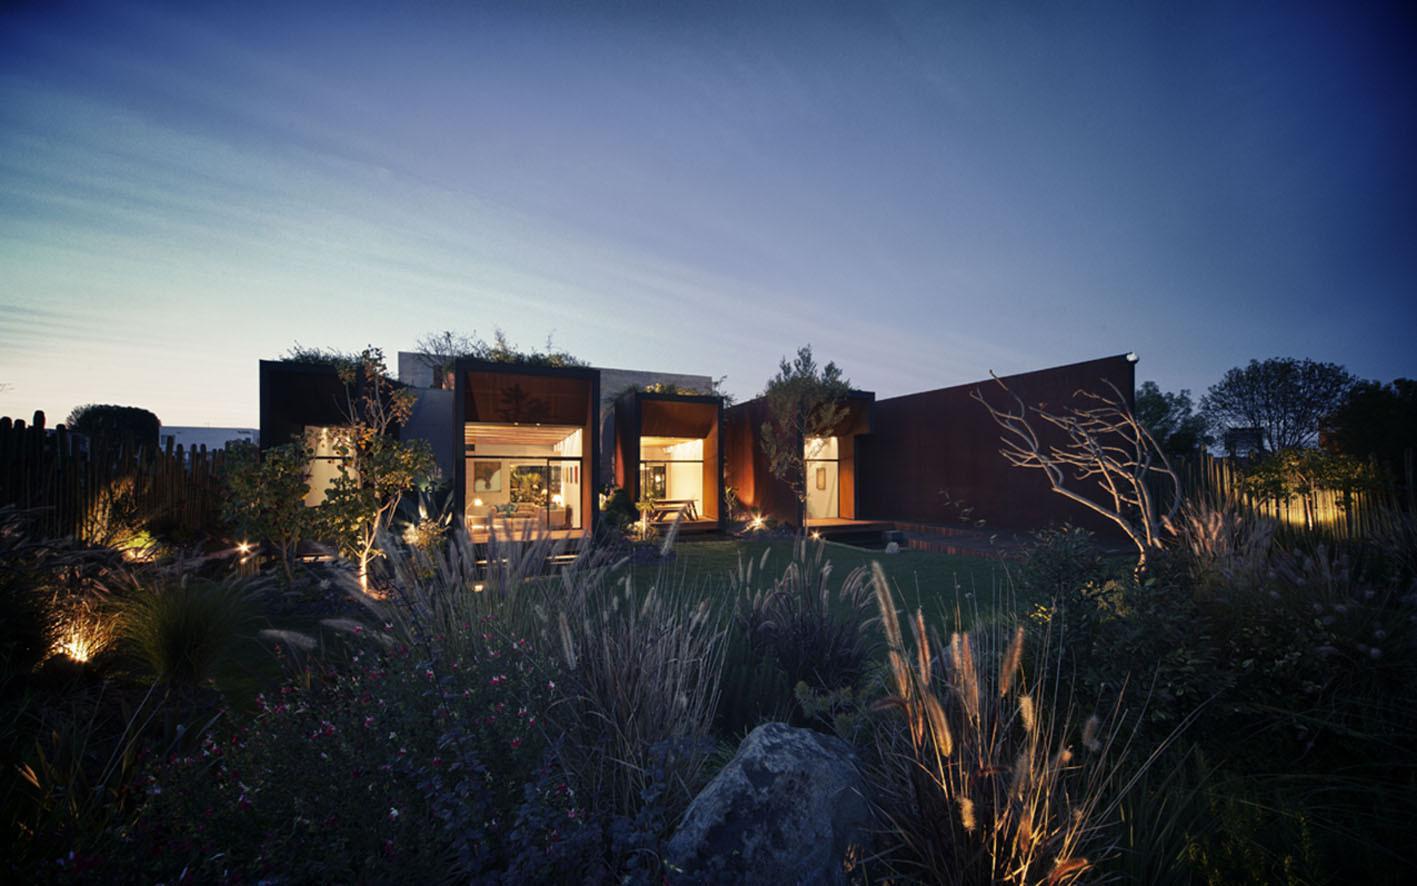 Vargas House / Isaac Broid Arquitecto, © Yoshihiro Koitani